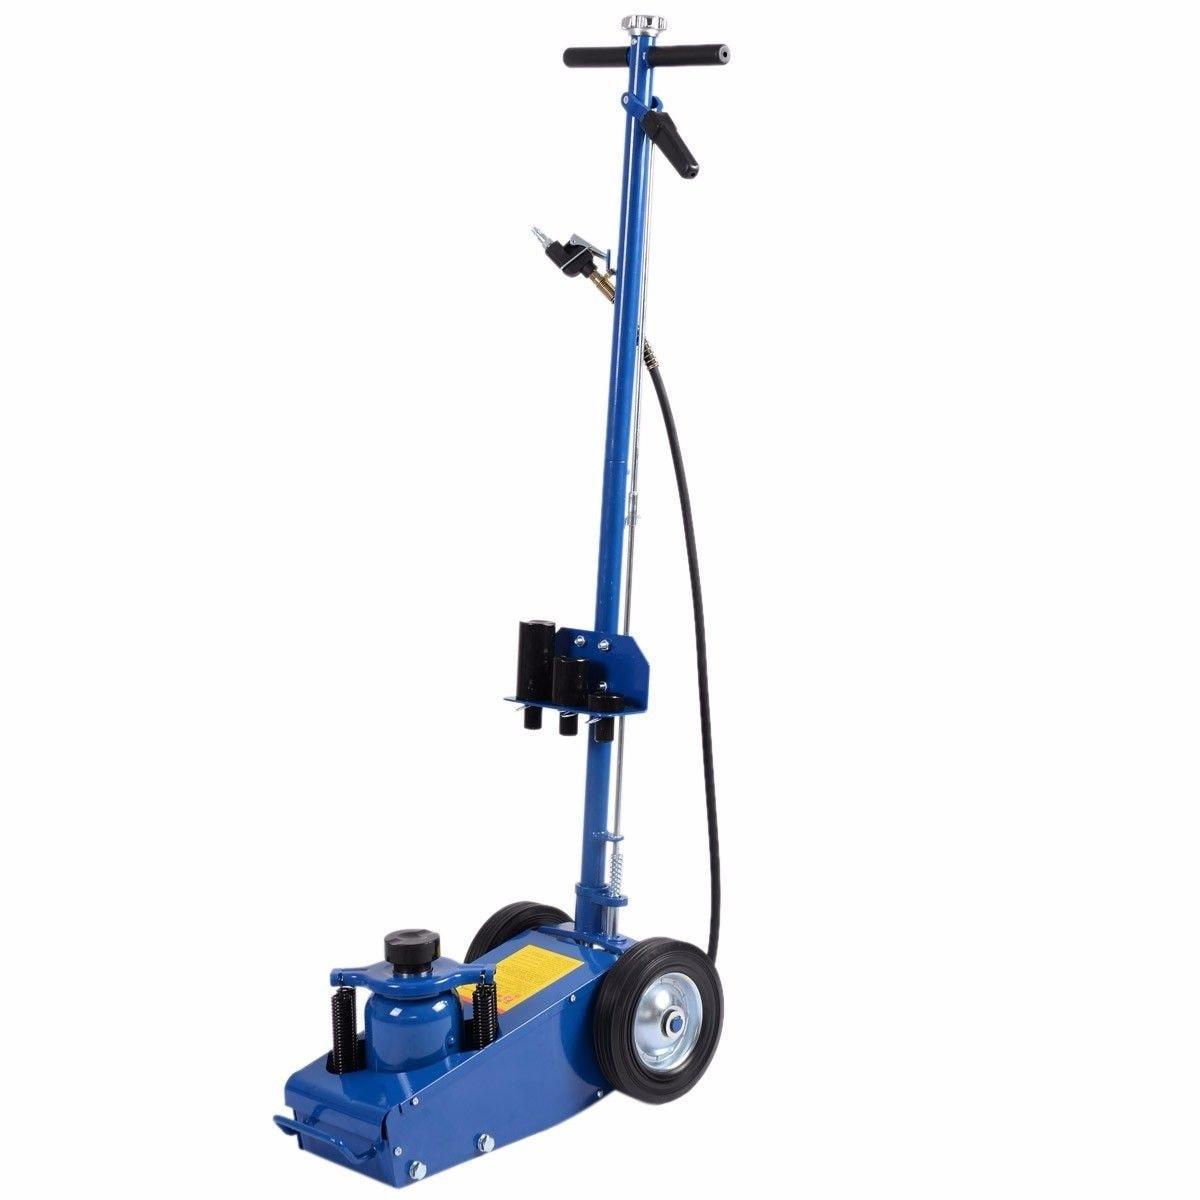 Shop Costway 22 Ton Air Hydraulic Floor Jack Repair Lifting Tool Parts Diagram Free Shipping Today 17157384